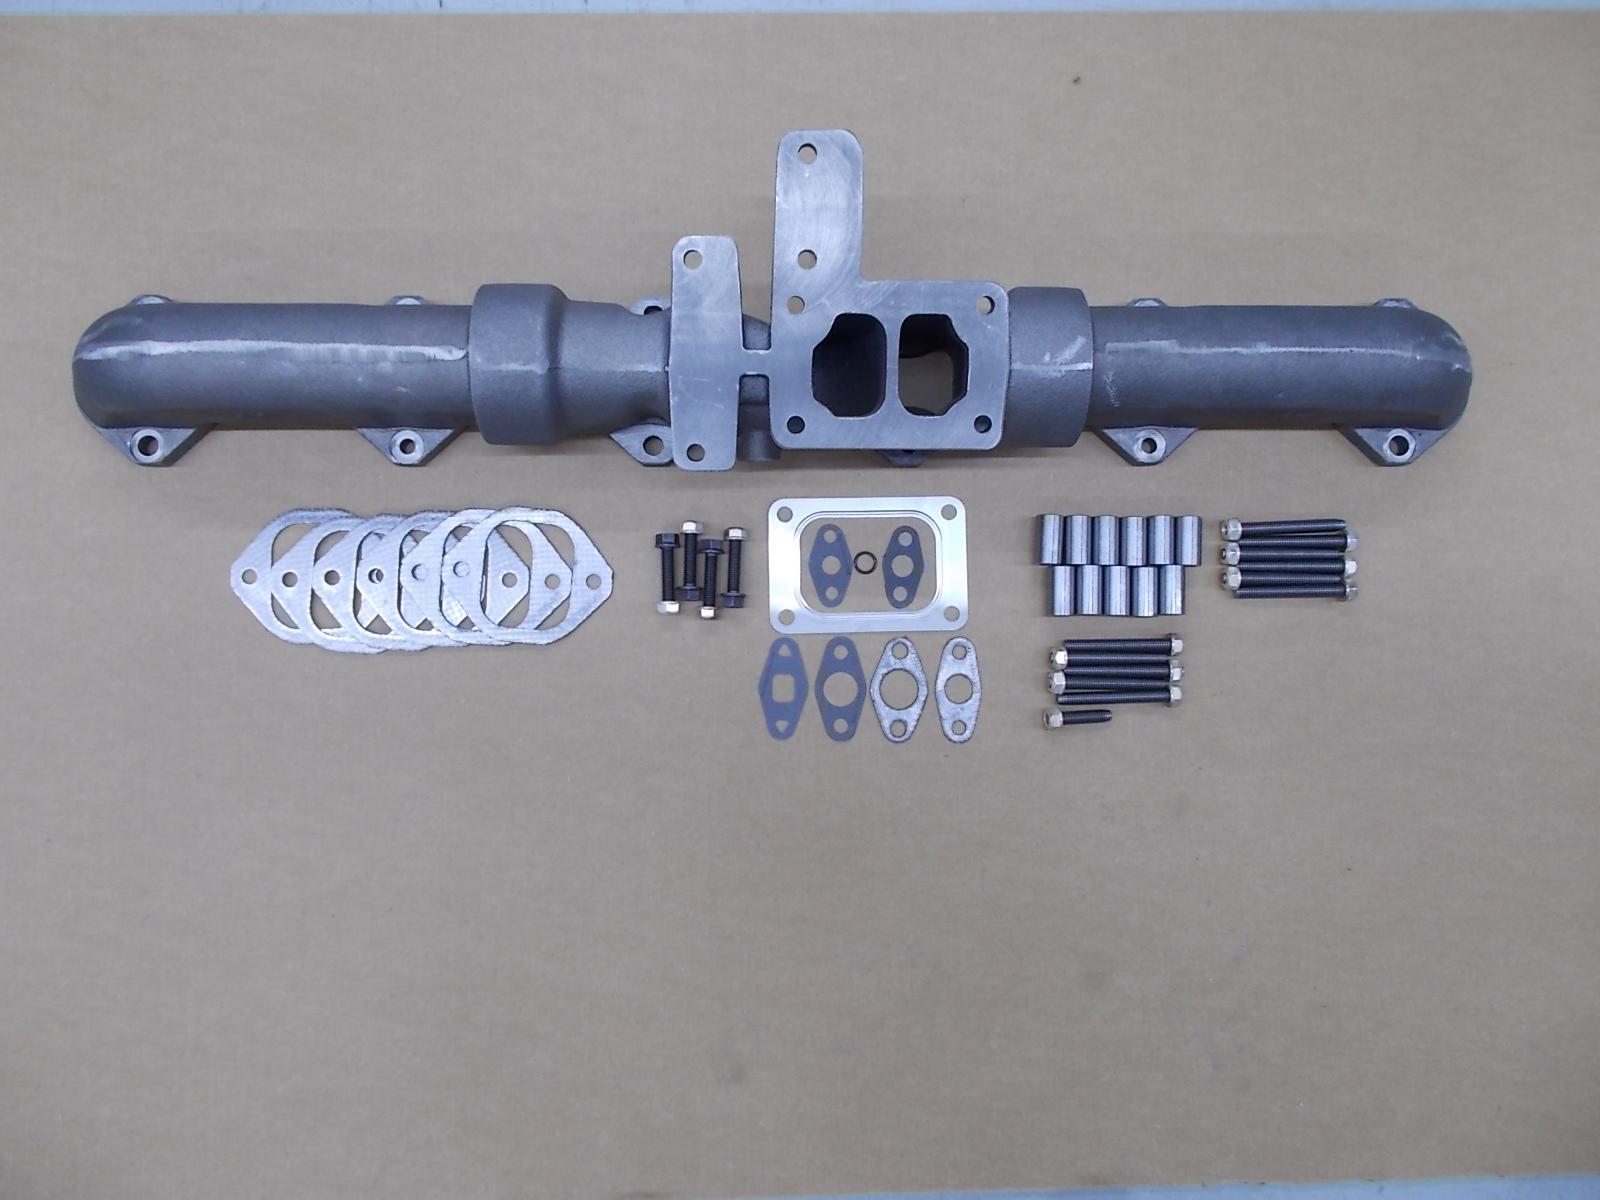 dirks1651 cat 3406 exhaust manifold kit